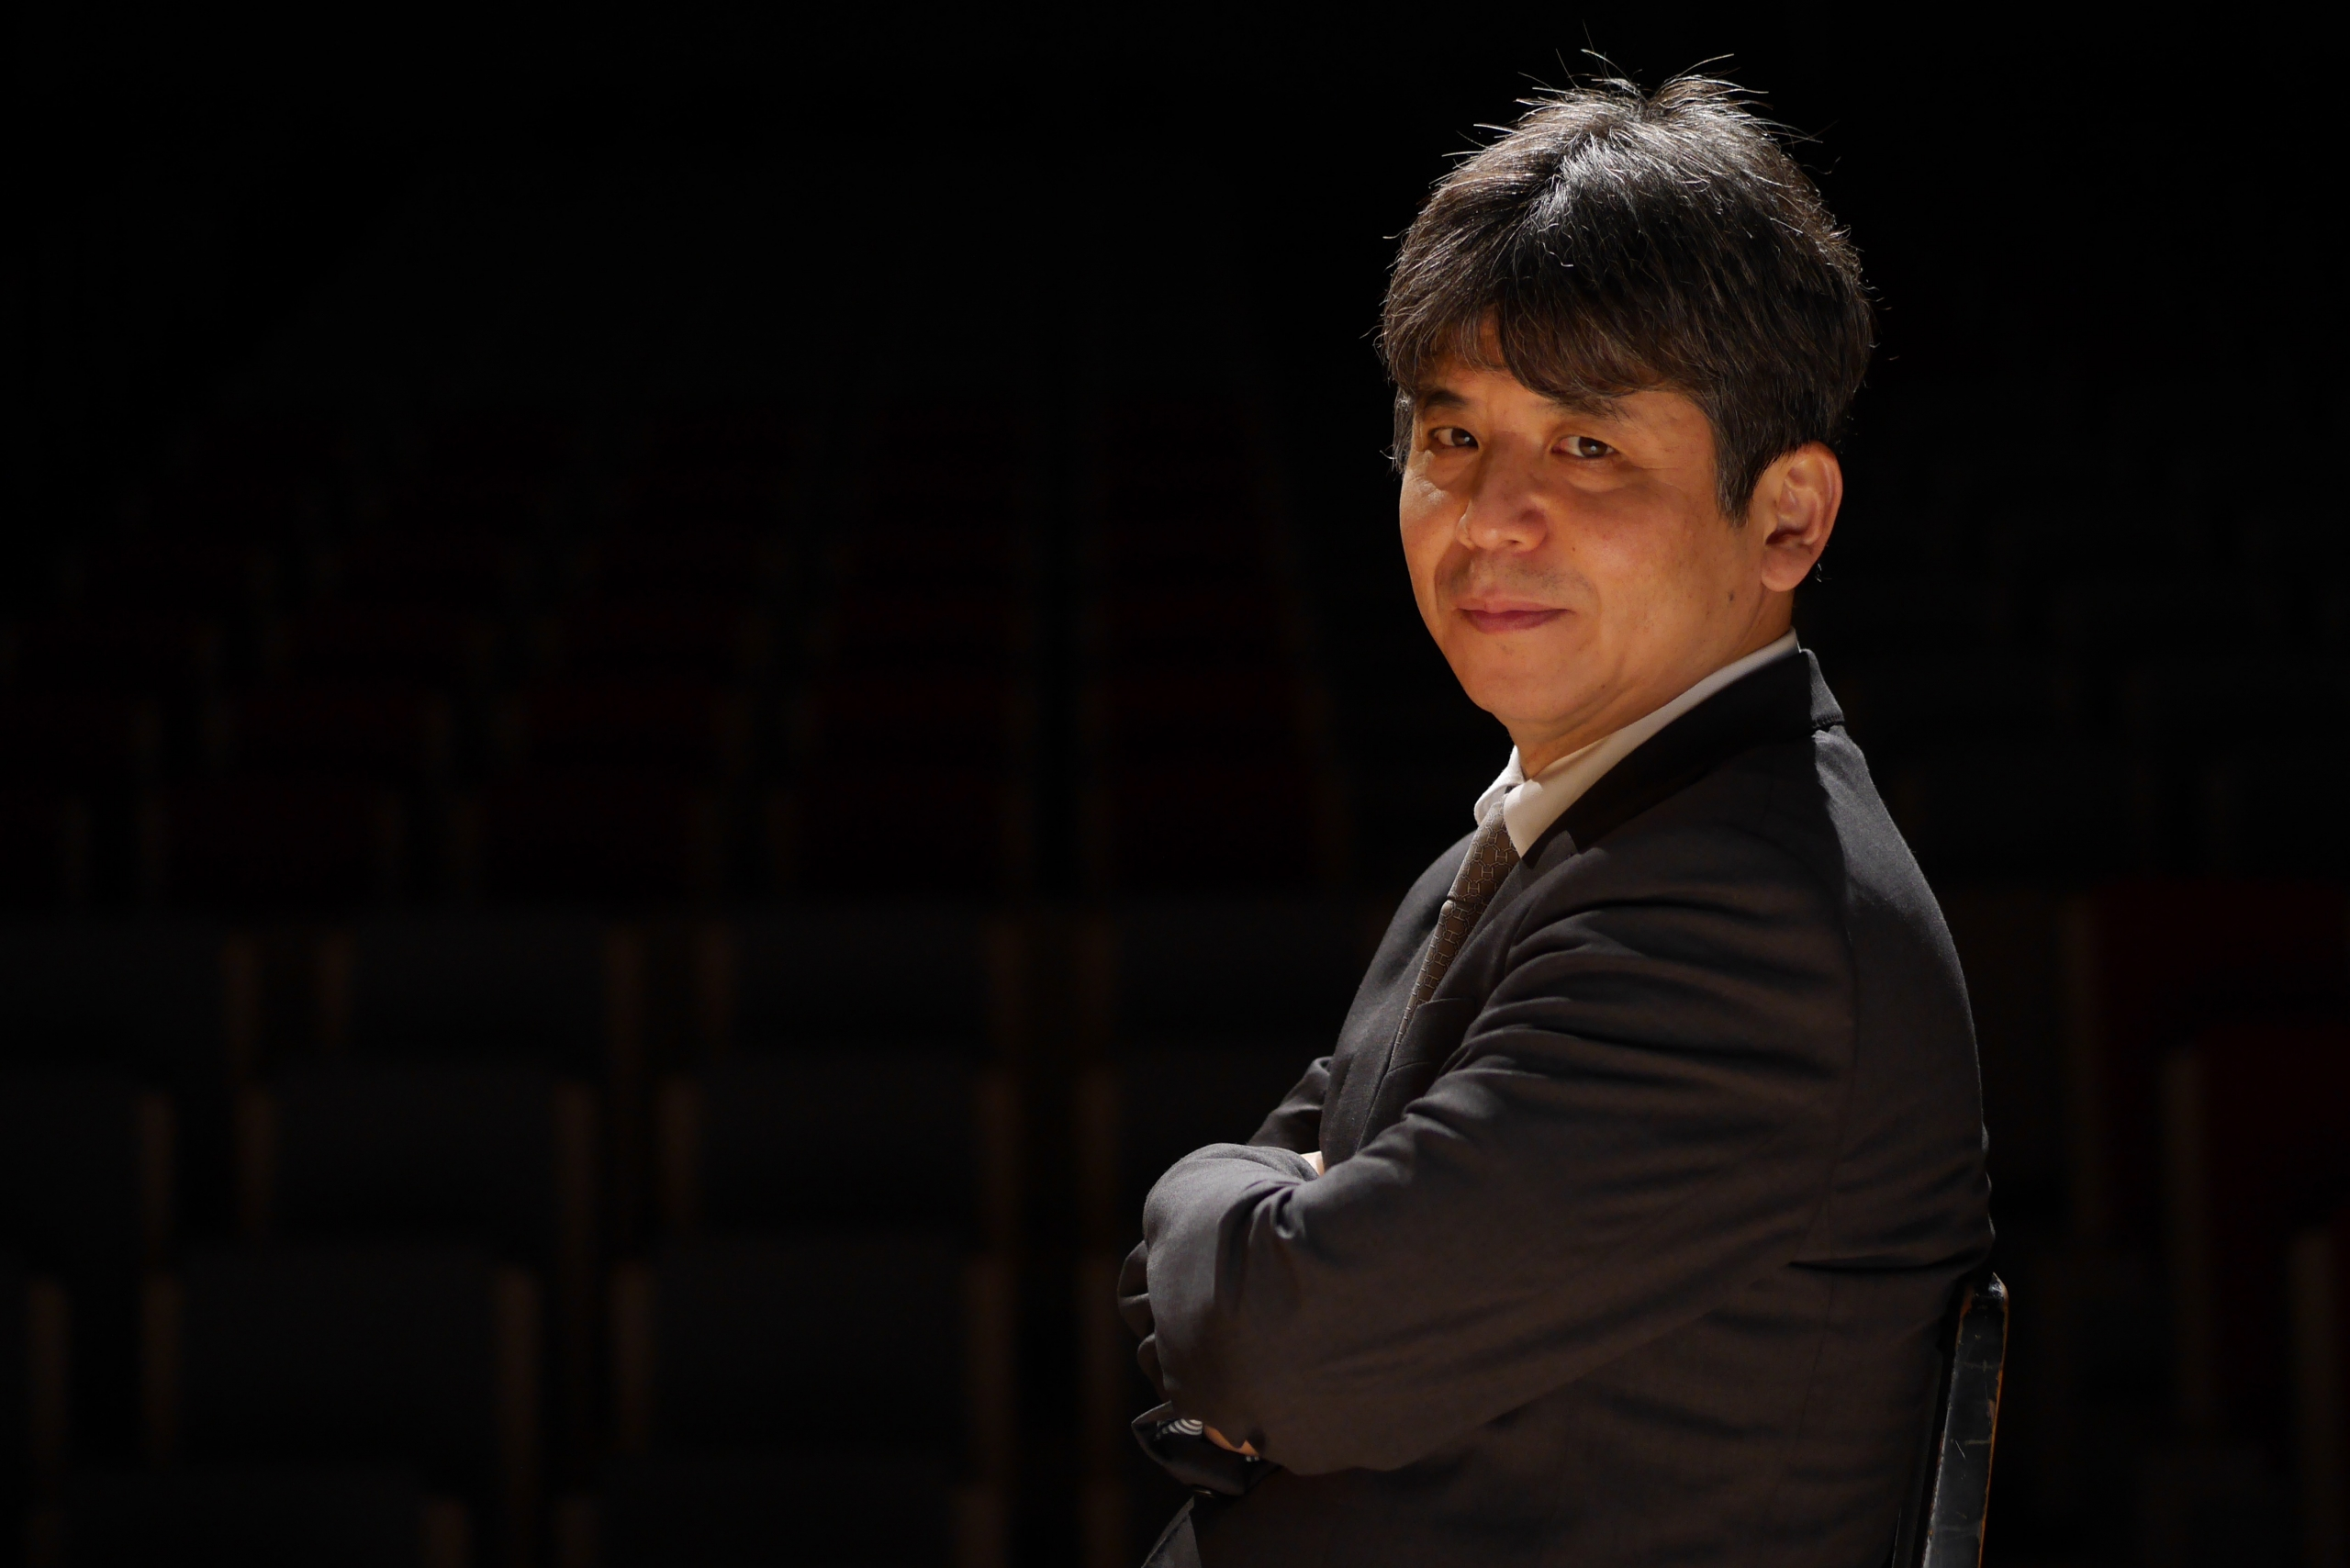 Toshio Hosokawa | Japanese Composer